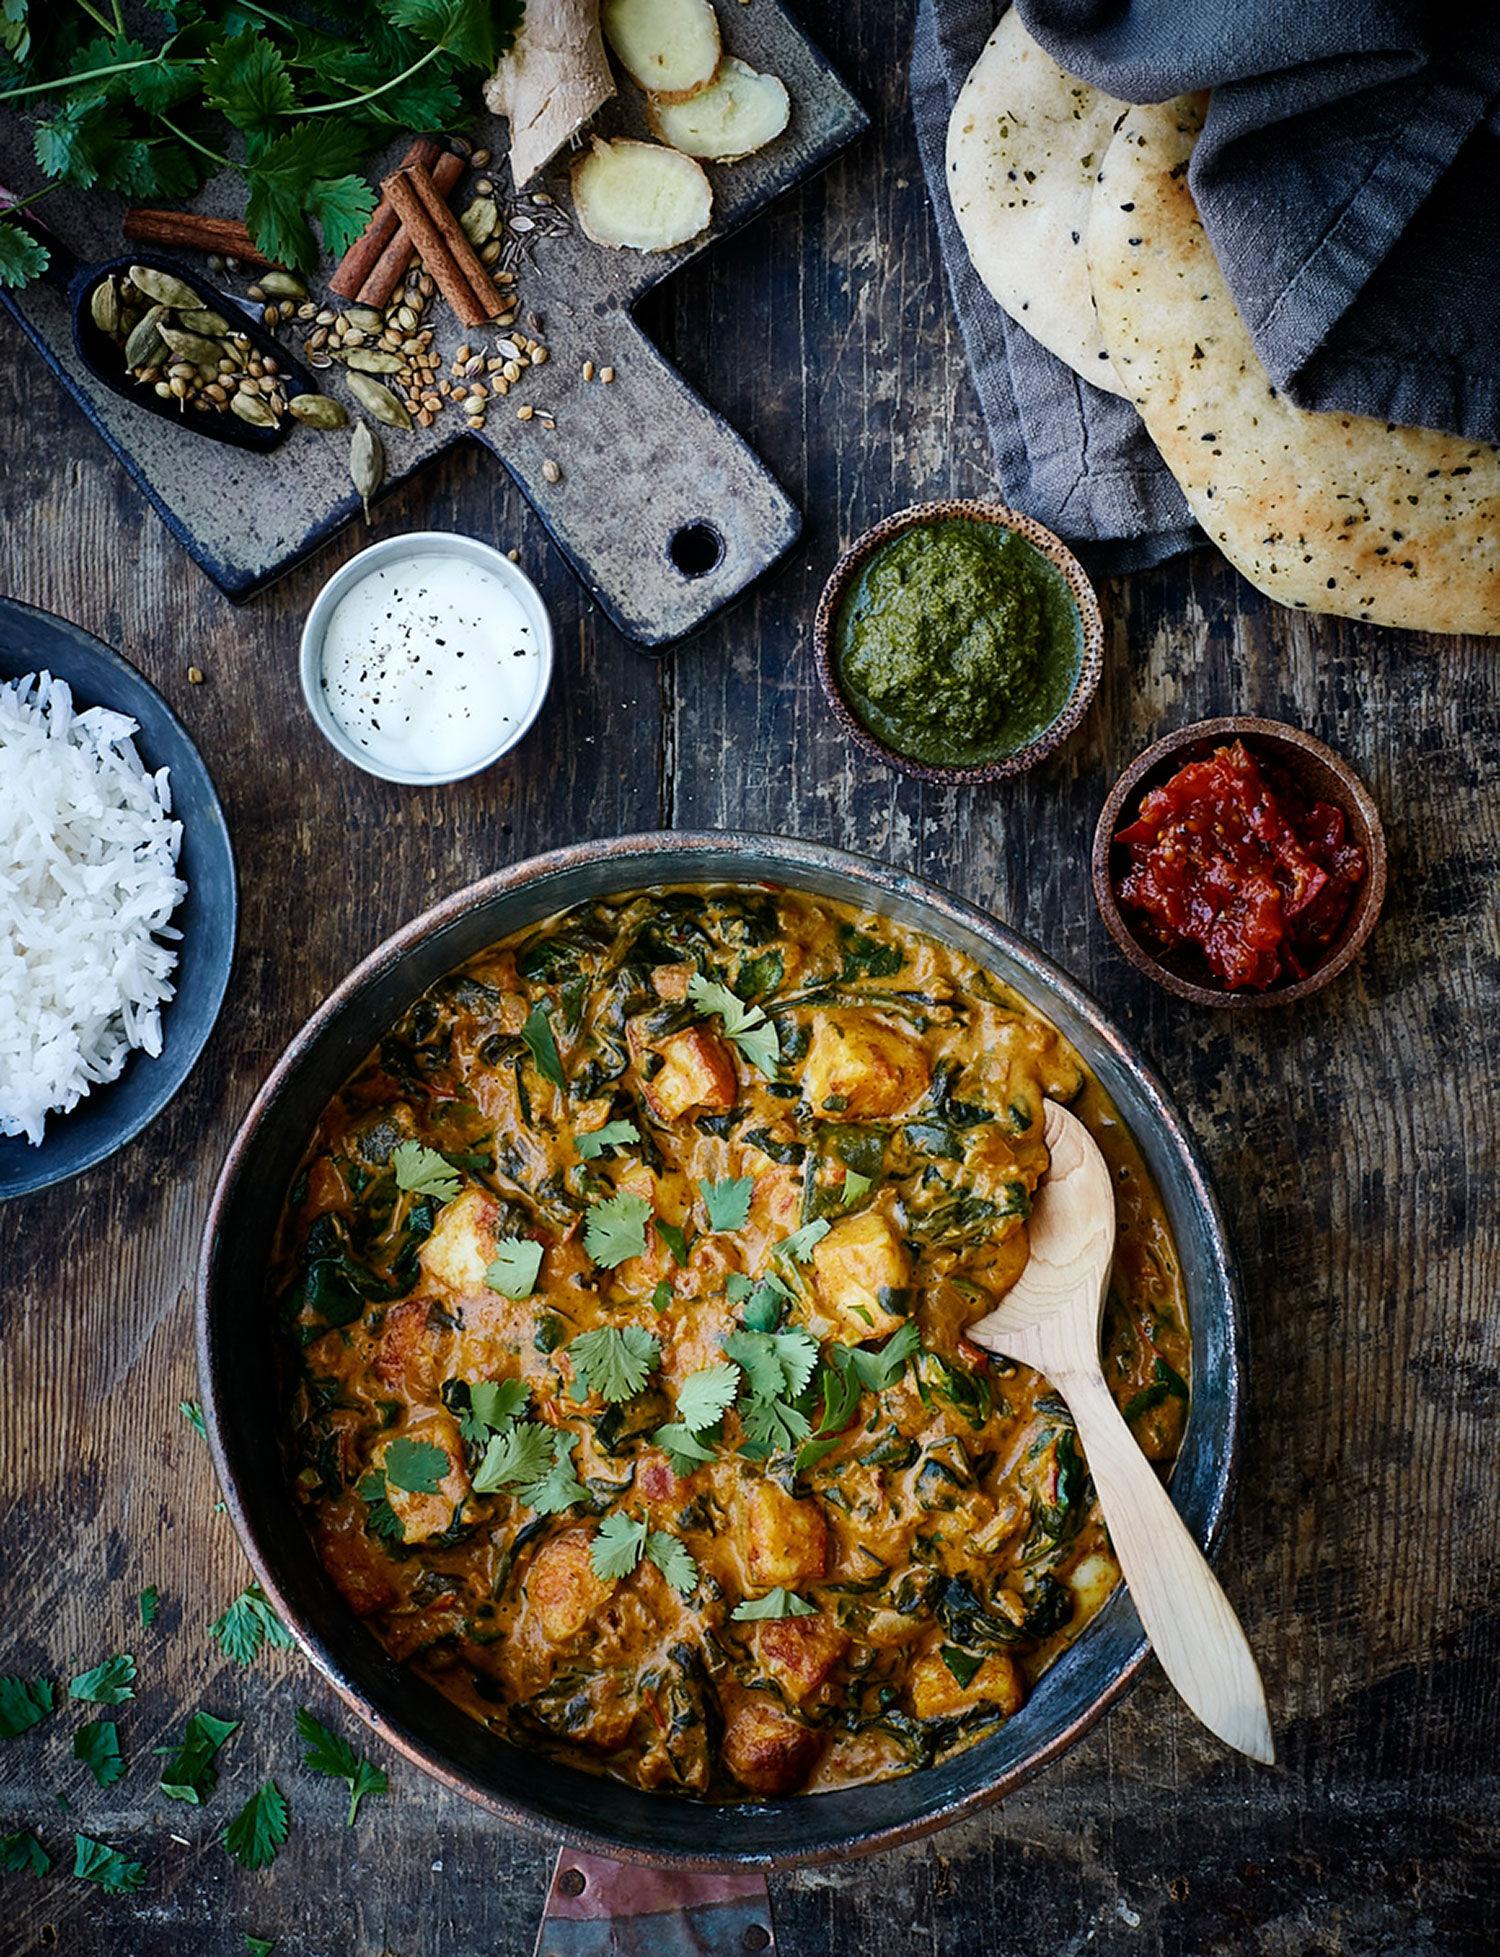 Vegetarisk indisk gryta med halloumi i gjutjärnsgryta